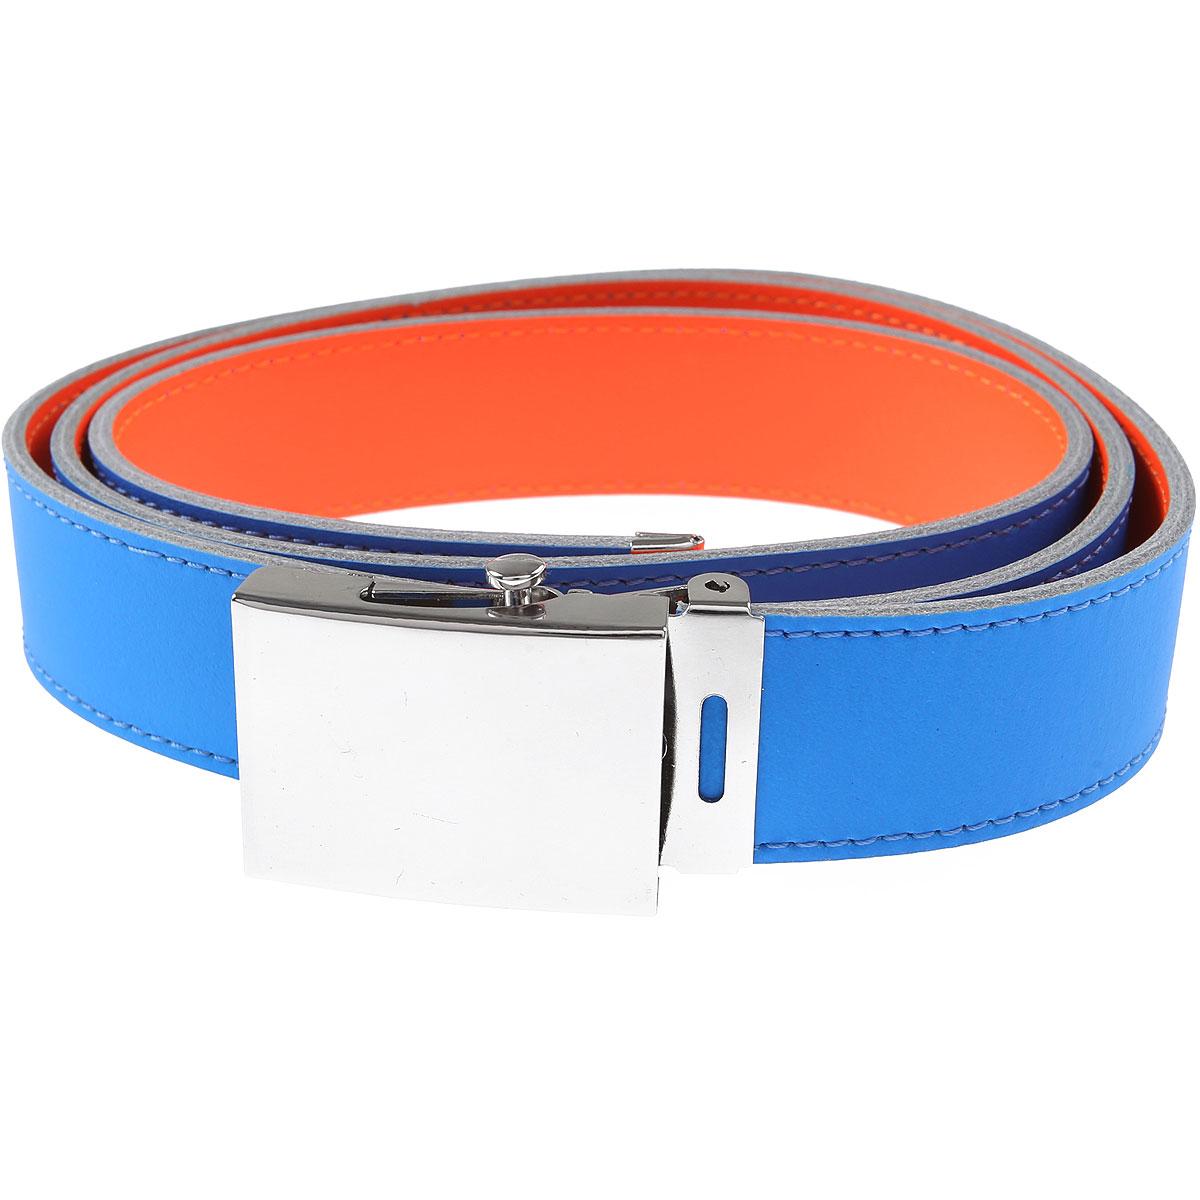 Comme des Garcons Belts On Sale, Fluo Blue, Leather, 2019